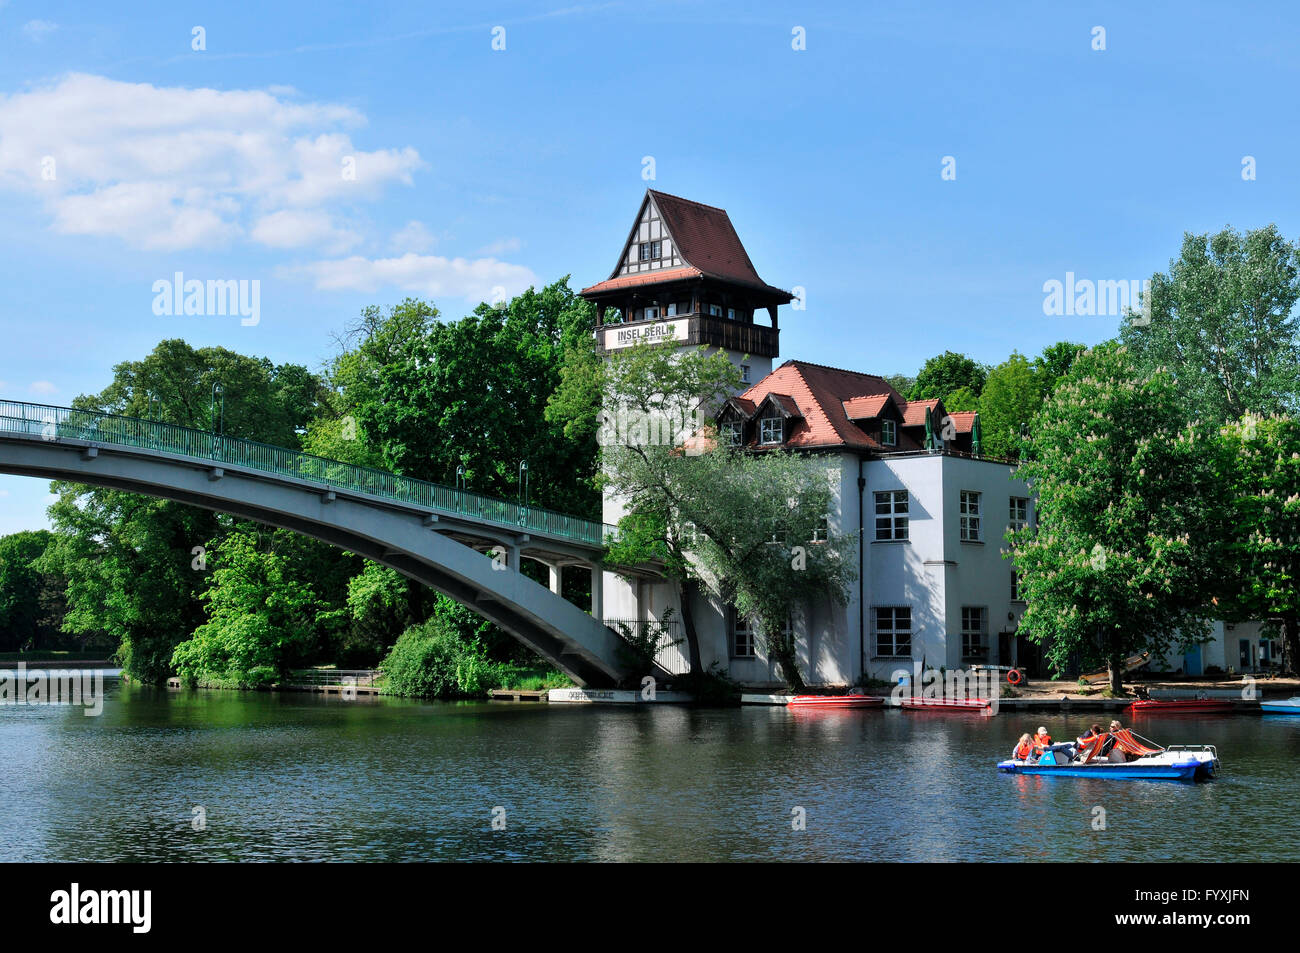 Insel der Jugend, Insel der Jugend, Spree, Treptow, Berlin, Deutschland Stockbild